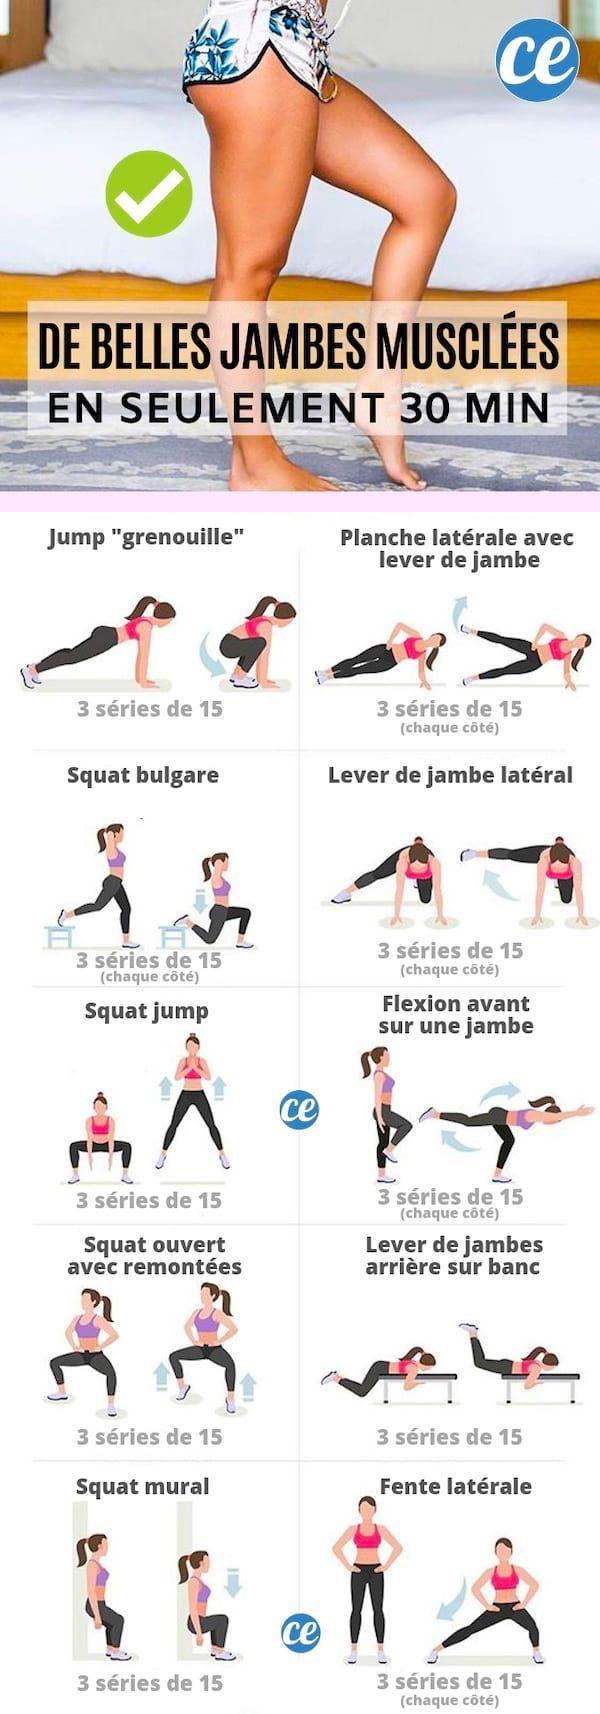 De Belles Jambes Fines Et Musclees En Seulement 30 Min Sans Equipement Muscler Les Jambes Exercice Jambes Exercices Jambes Fines